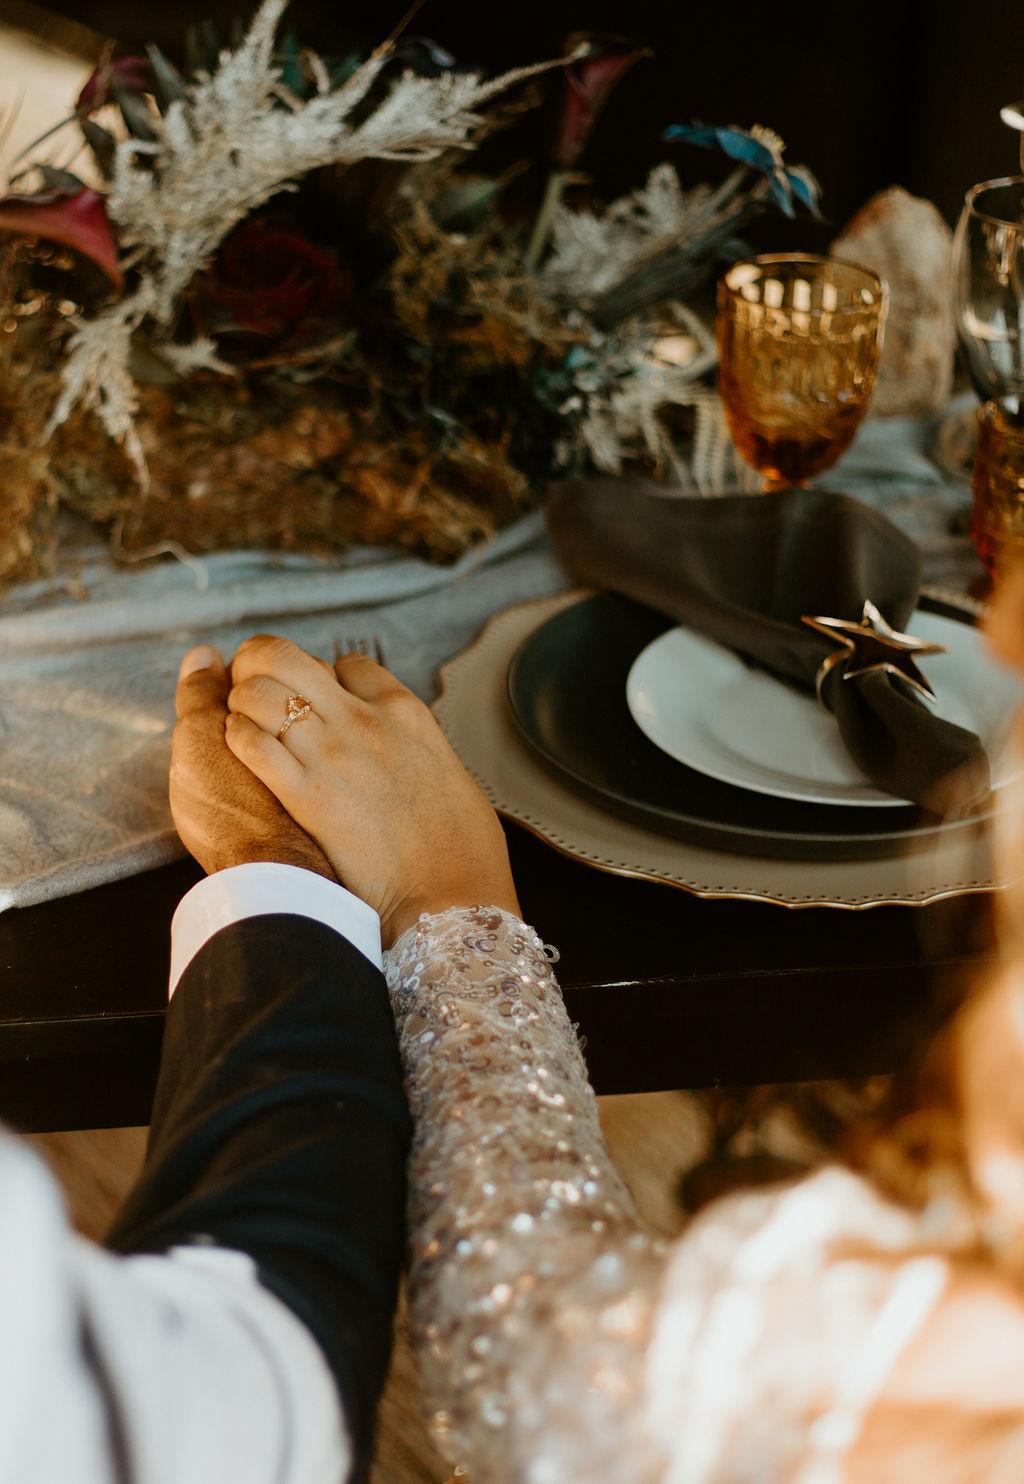 Wedding ring on women holding groom's hand